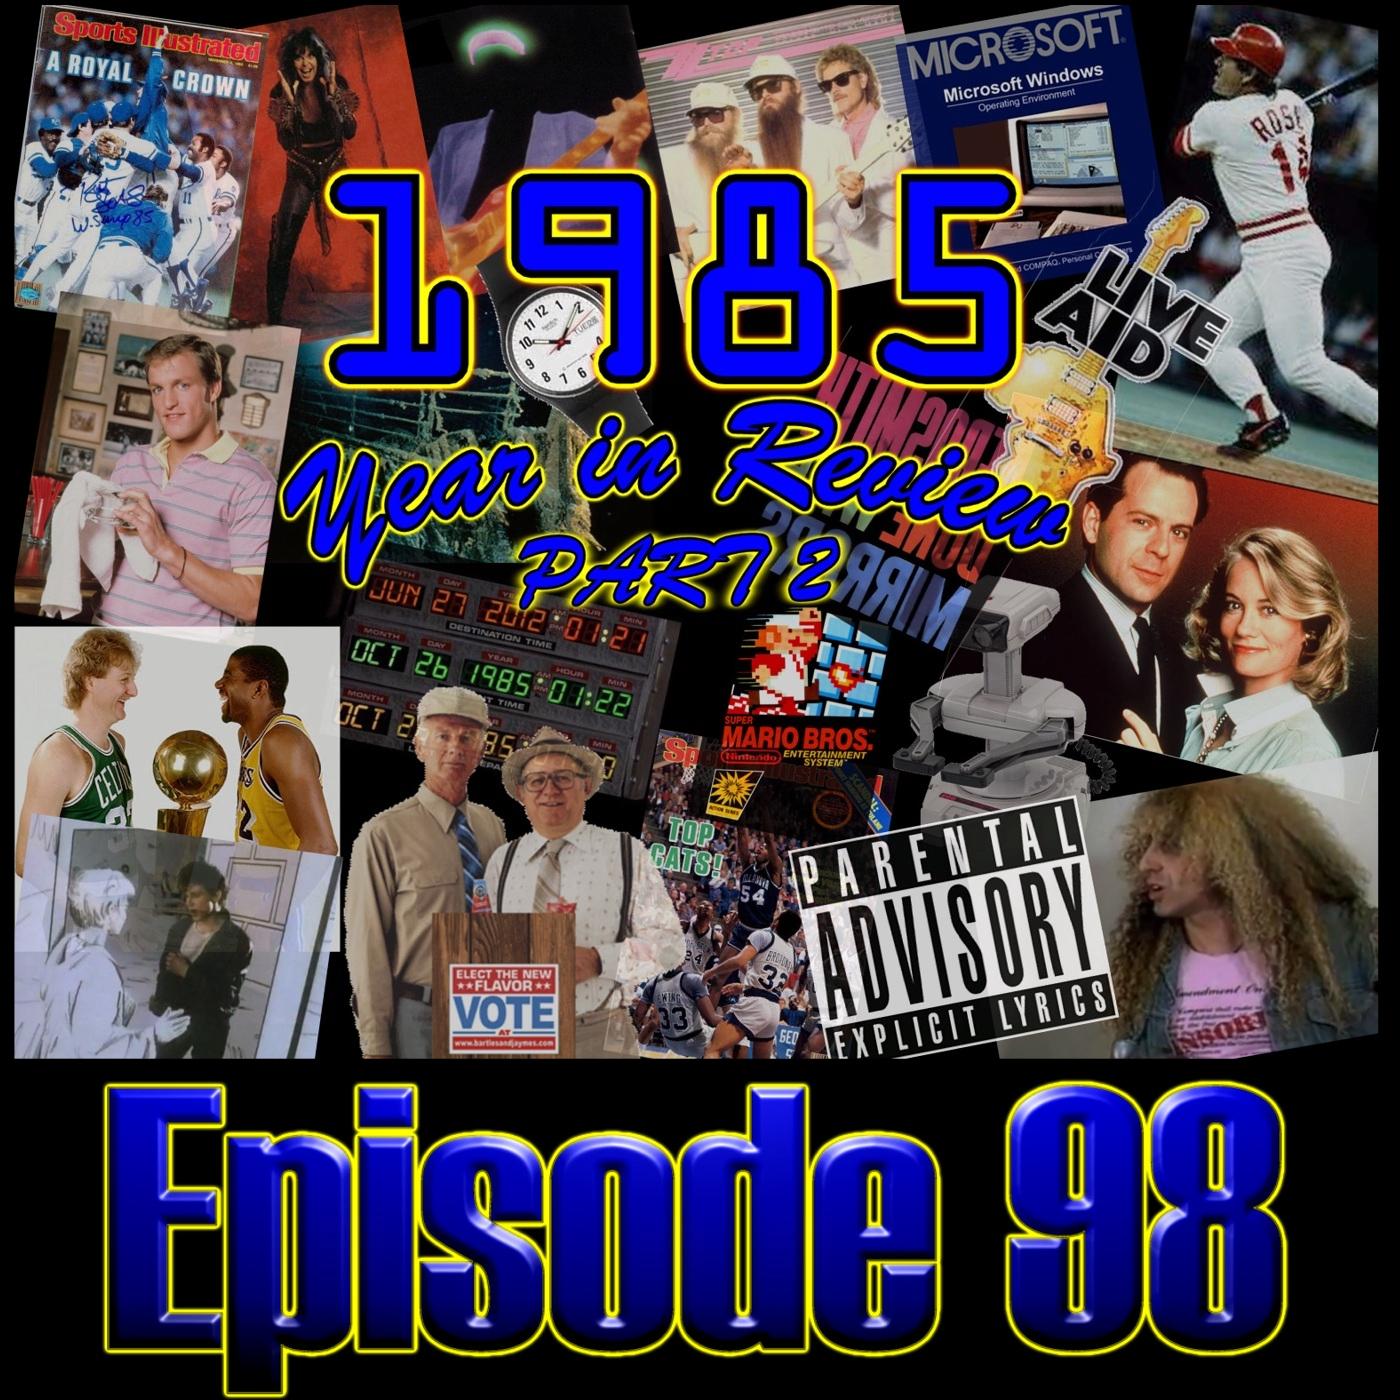 Decibel Geek Podcast : Episode 98 - 1985 Year in Review Part 2